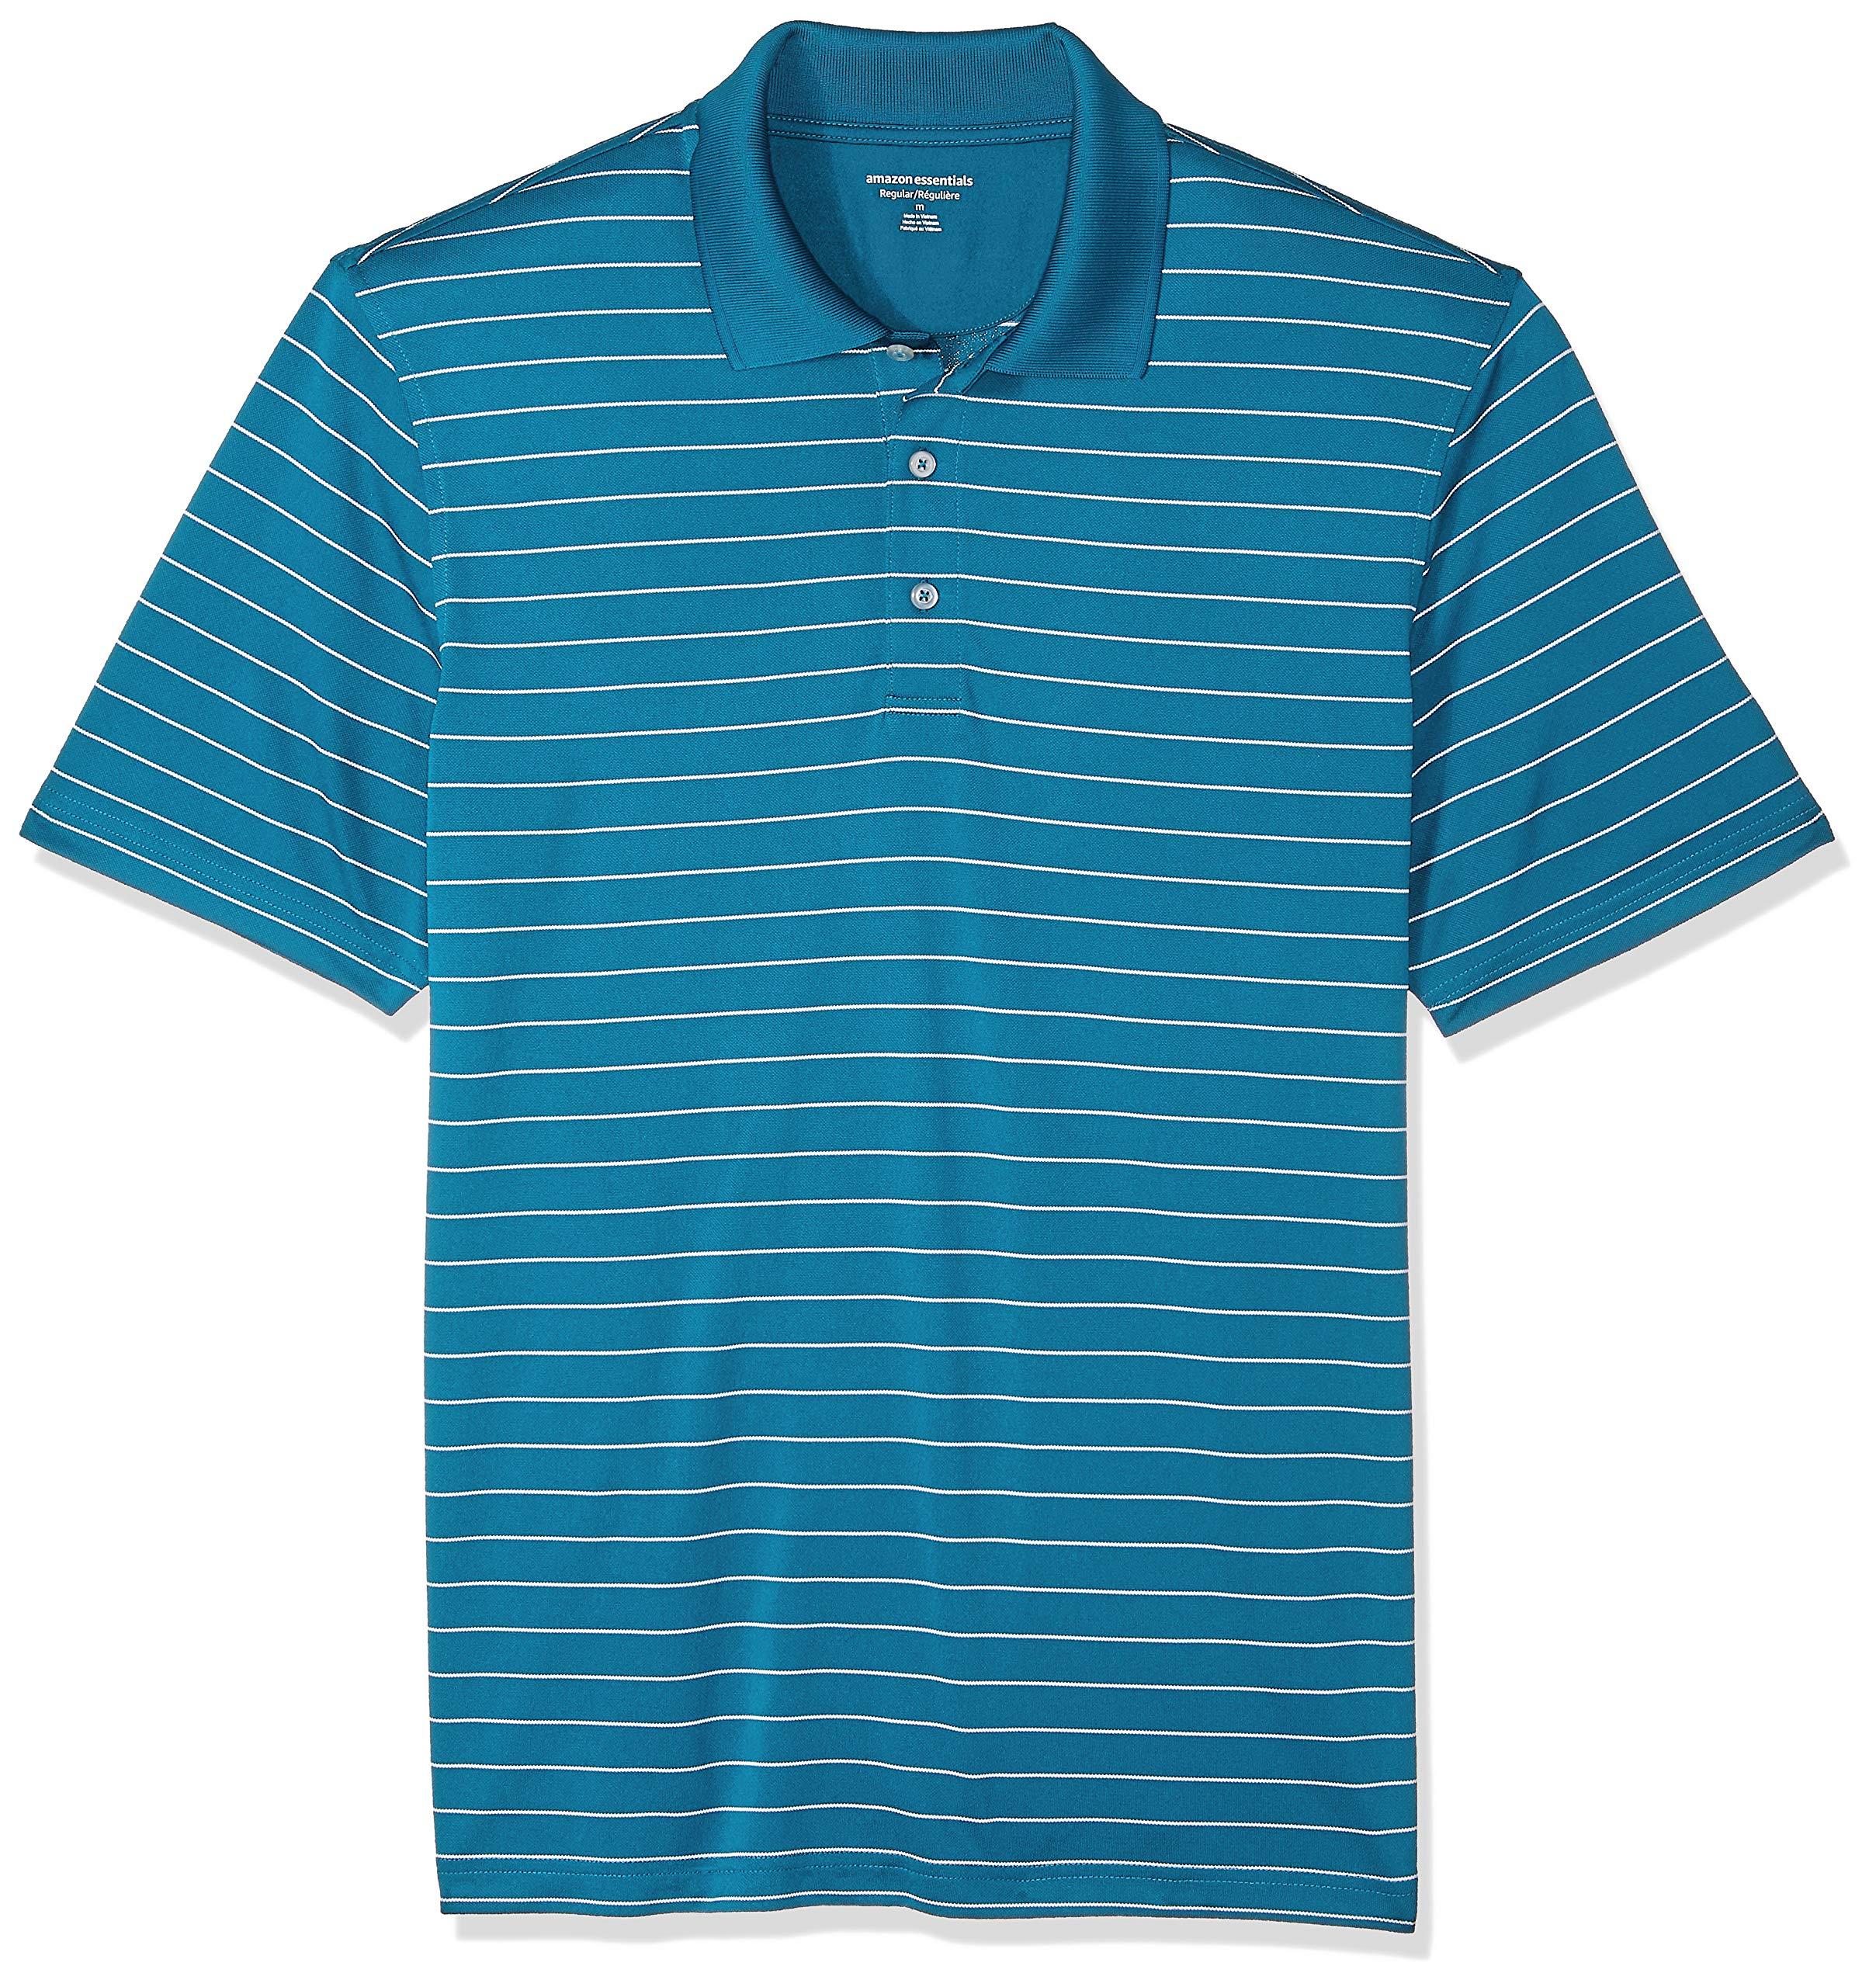 Amazon Essentials Men's Regular-Fit Quick-Dry Golf Polo Shirt, Dark Teal Stripe, X-Small